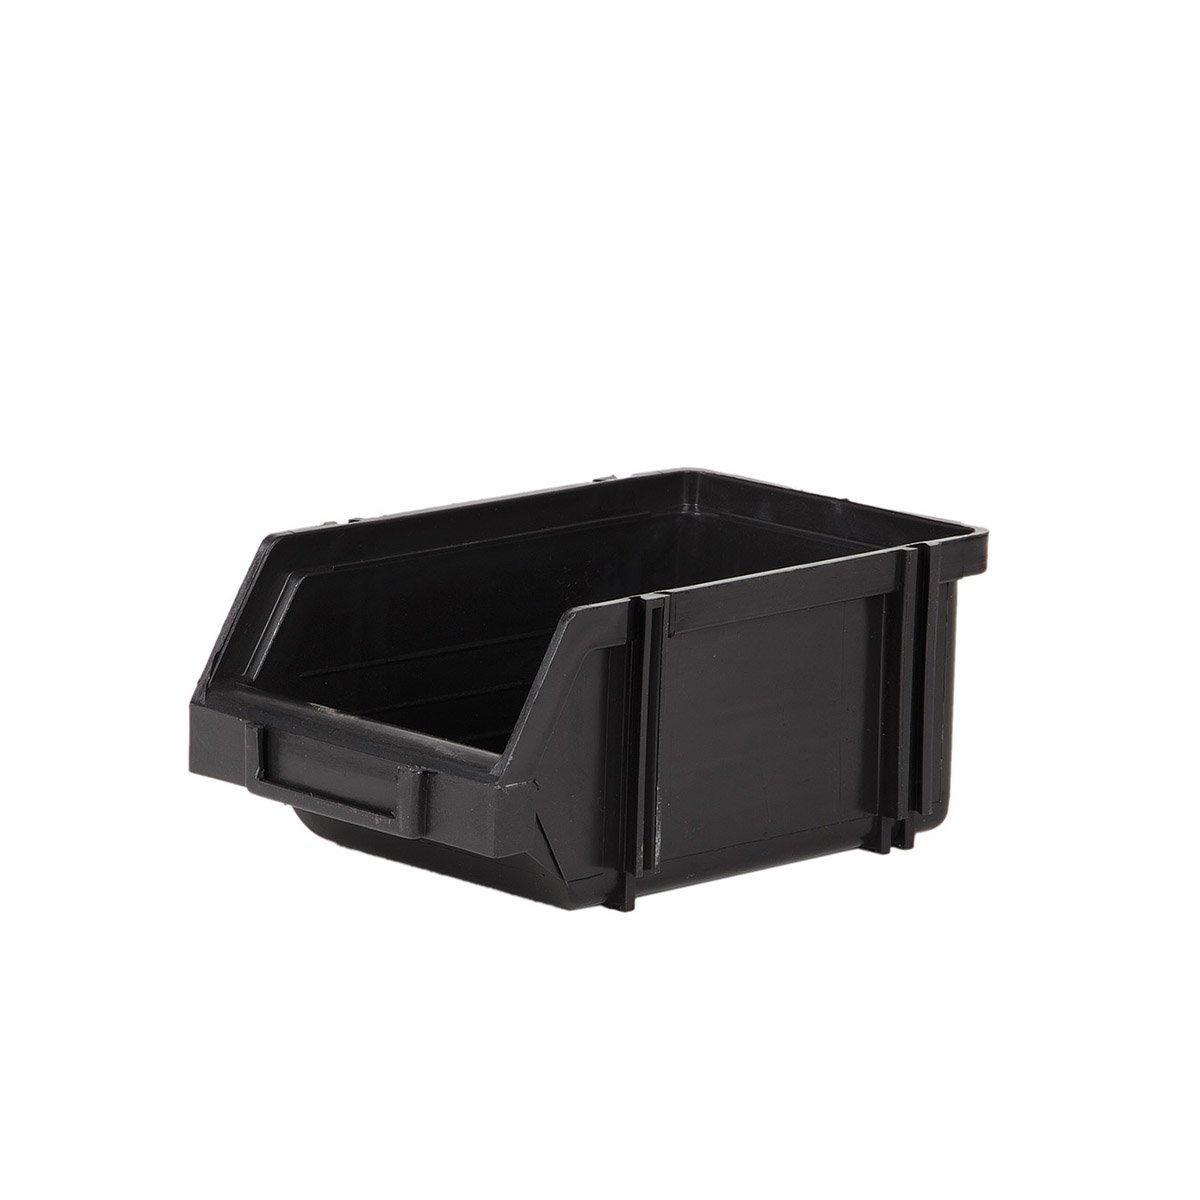 1 scatola impilabile da 1 litro, misura 1, scatola impilabile, scatola portaoggetti, nero myBoxshop